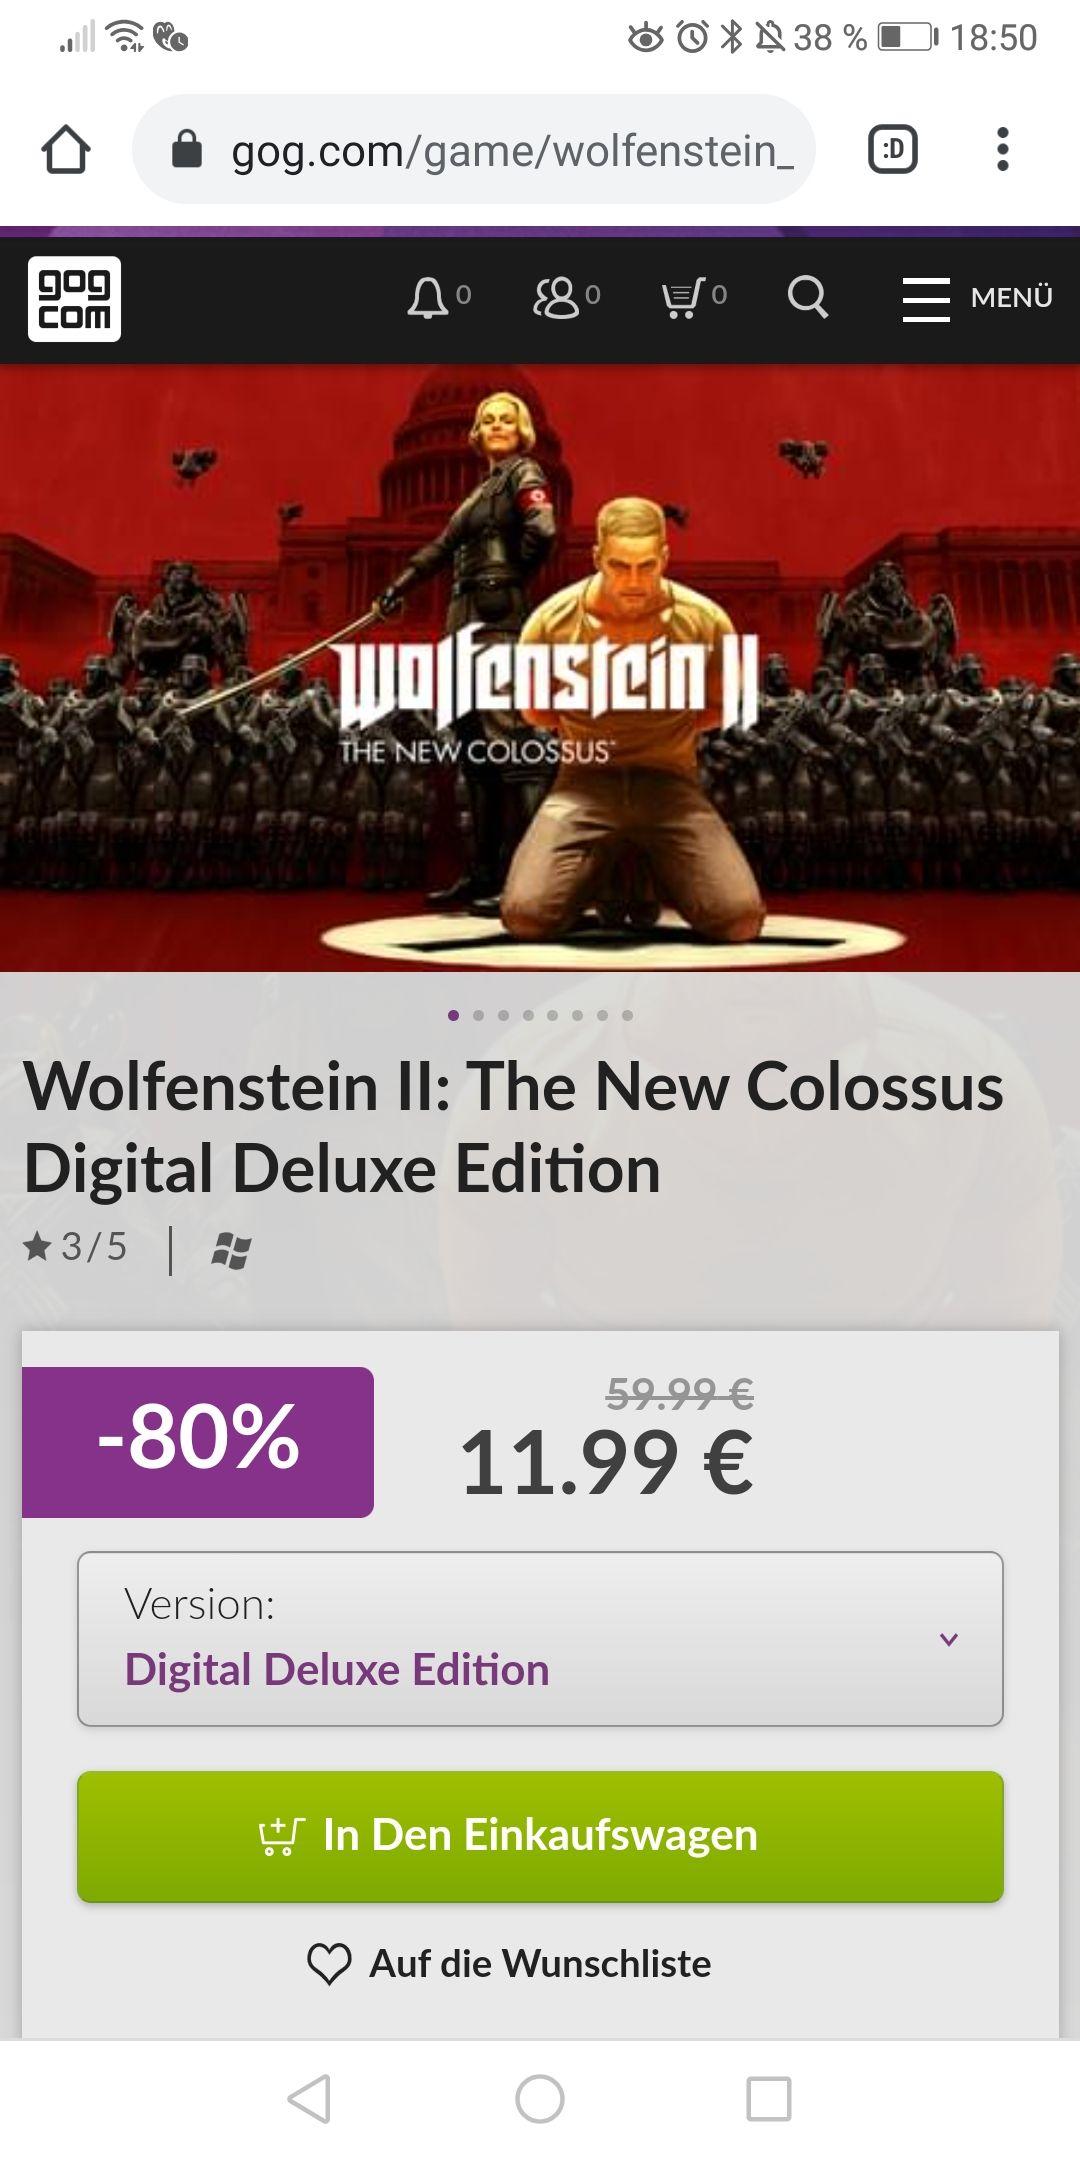 Wolfenstein II The New Colossus Digital Deluxe Edition (GOG)